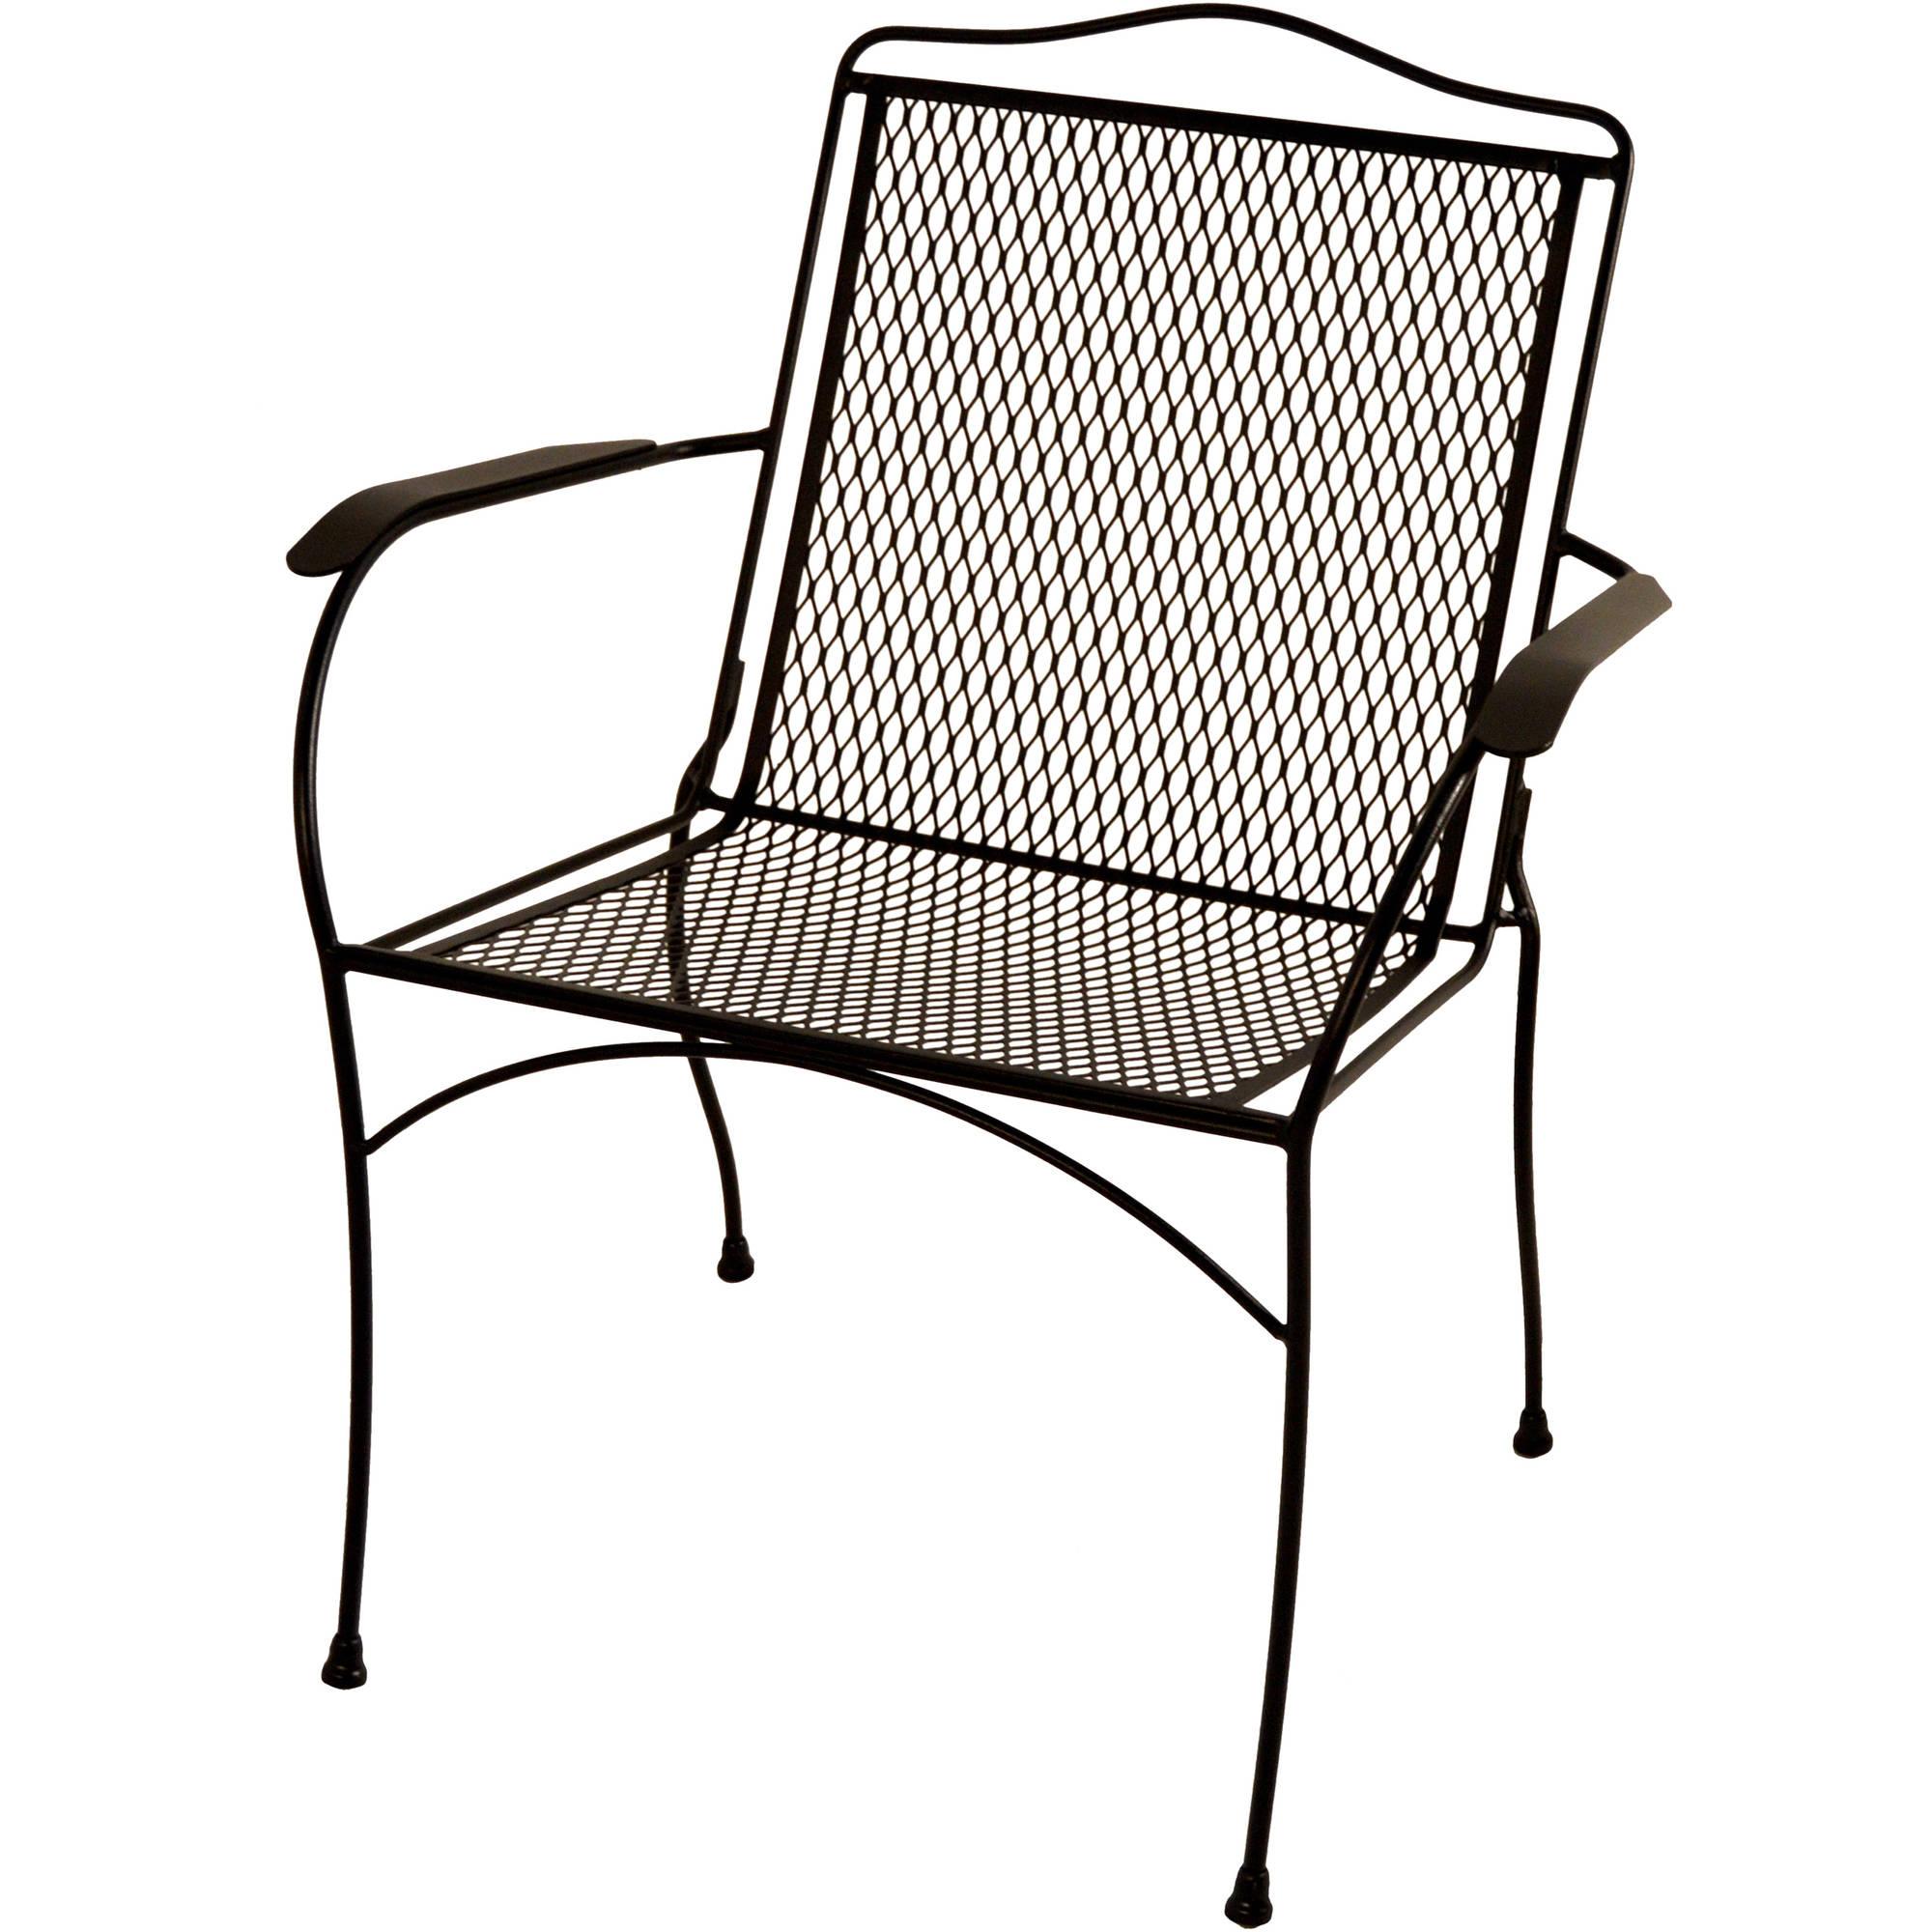 wrought iron chairs arlington house wrought iron chair KMRMKTB